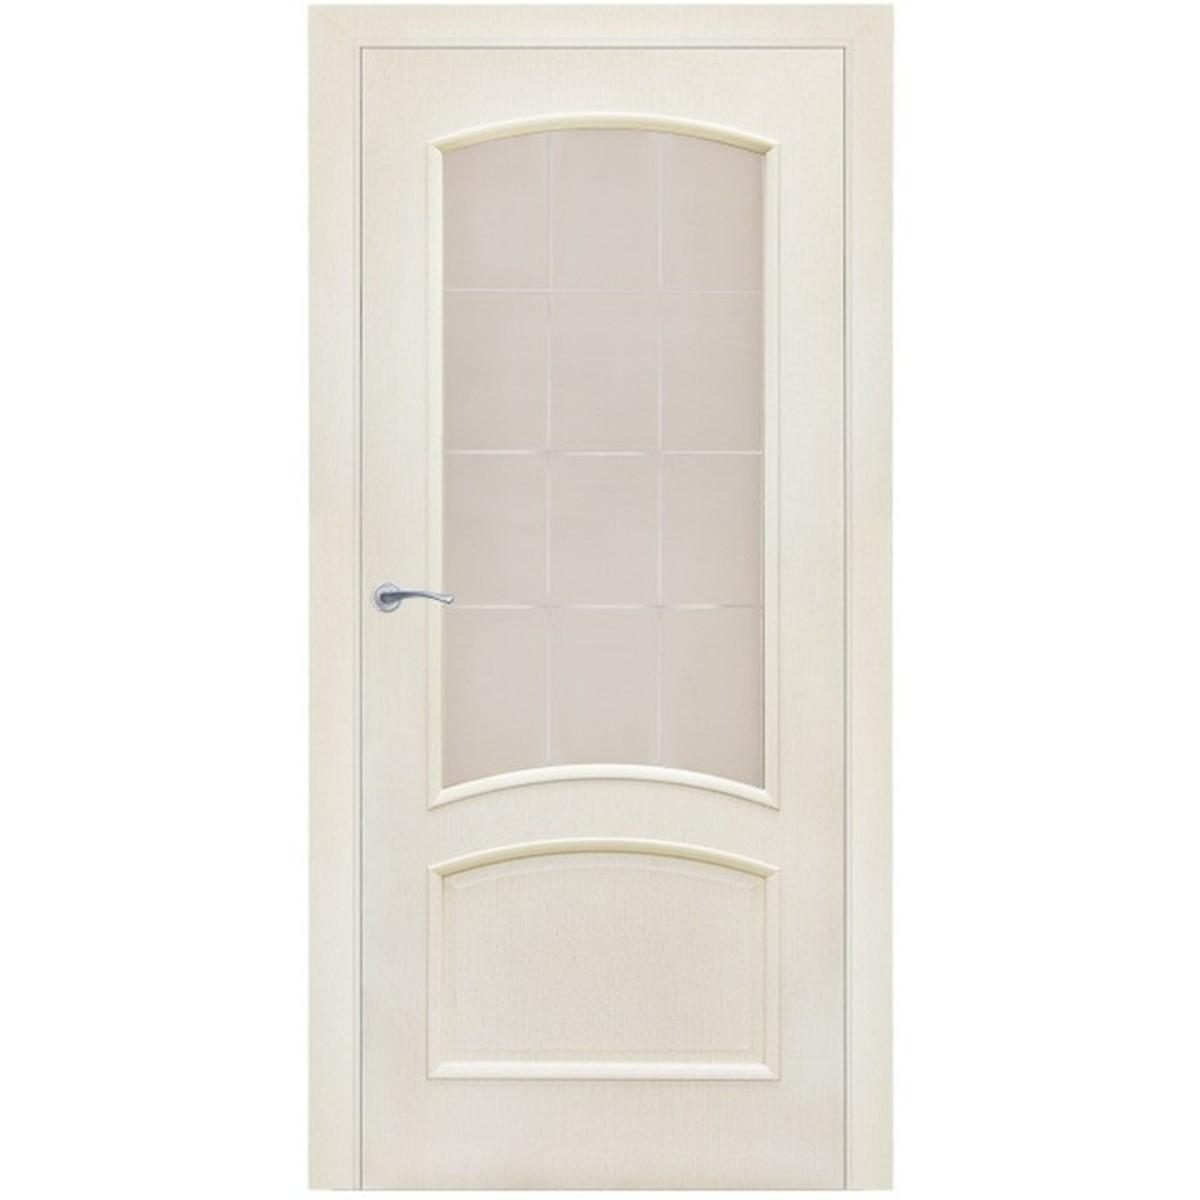 Дверь Межкомнатная Остеклённая Bravo 70x200 Ламинация Цвет Меланж